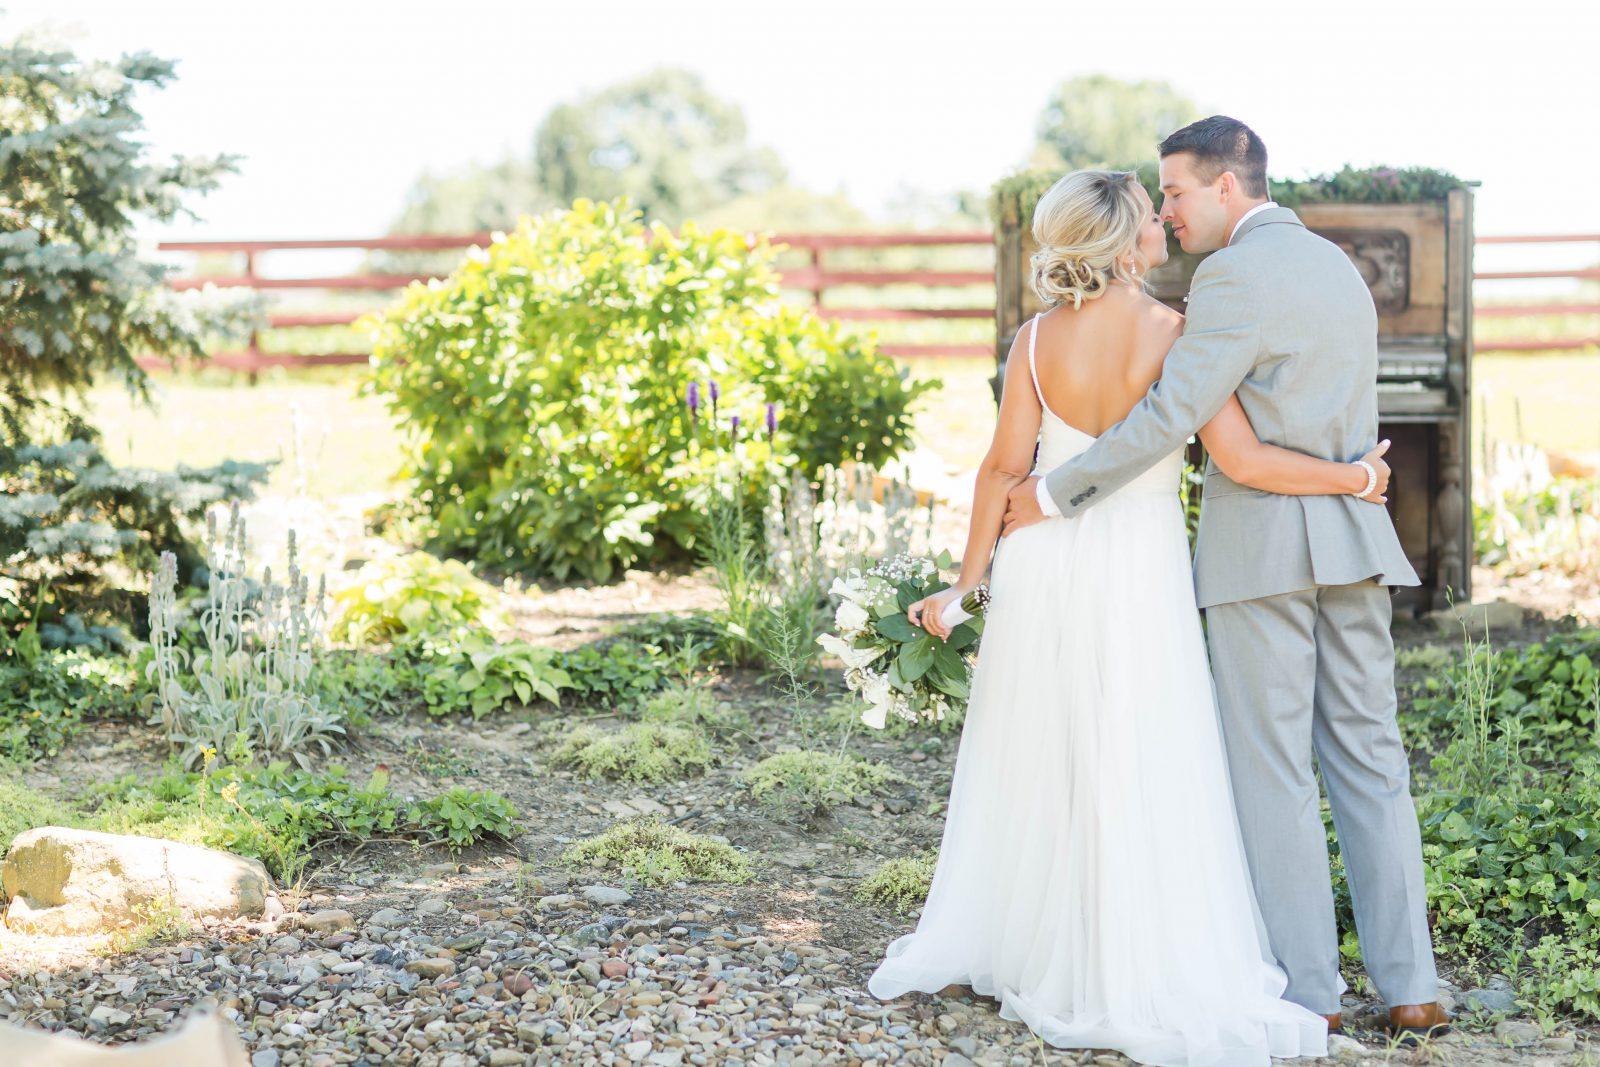 peacock-ridge-summer-wedding-photographer-akron-ohio-loren-jackson-photography-50